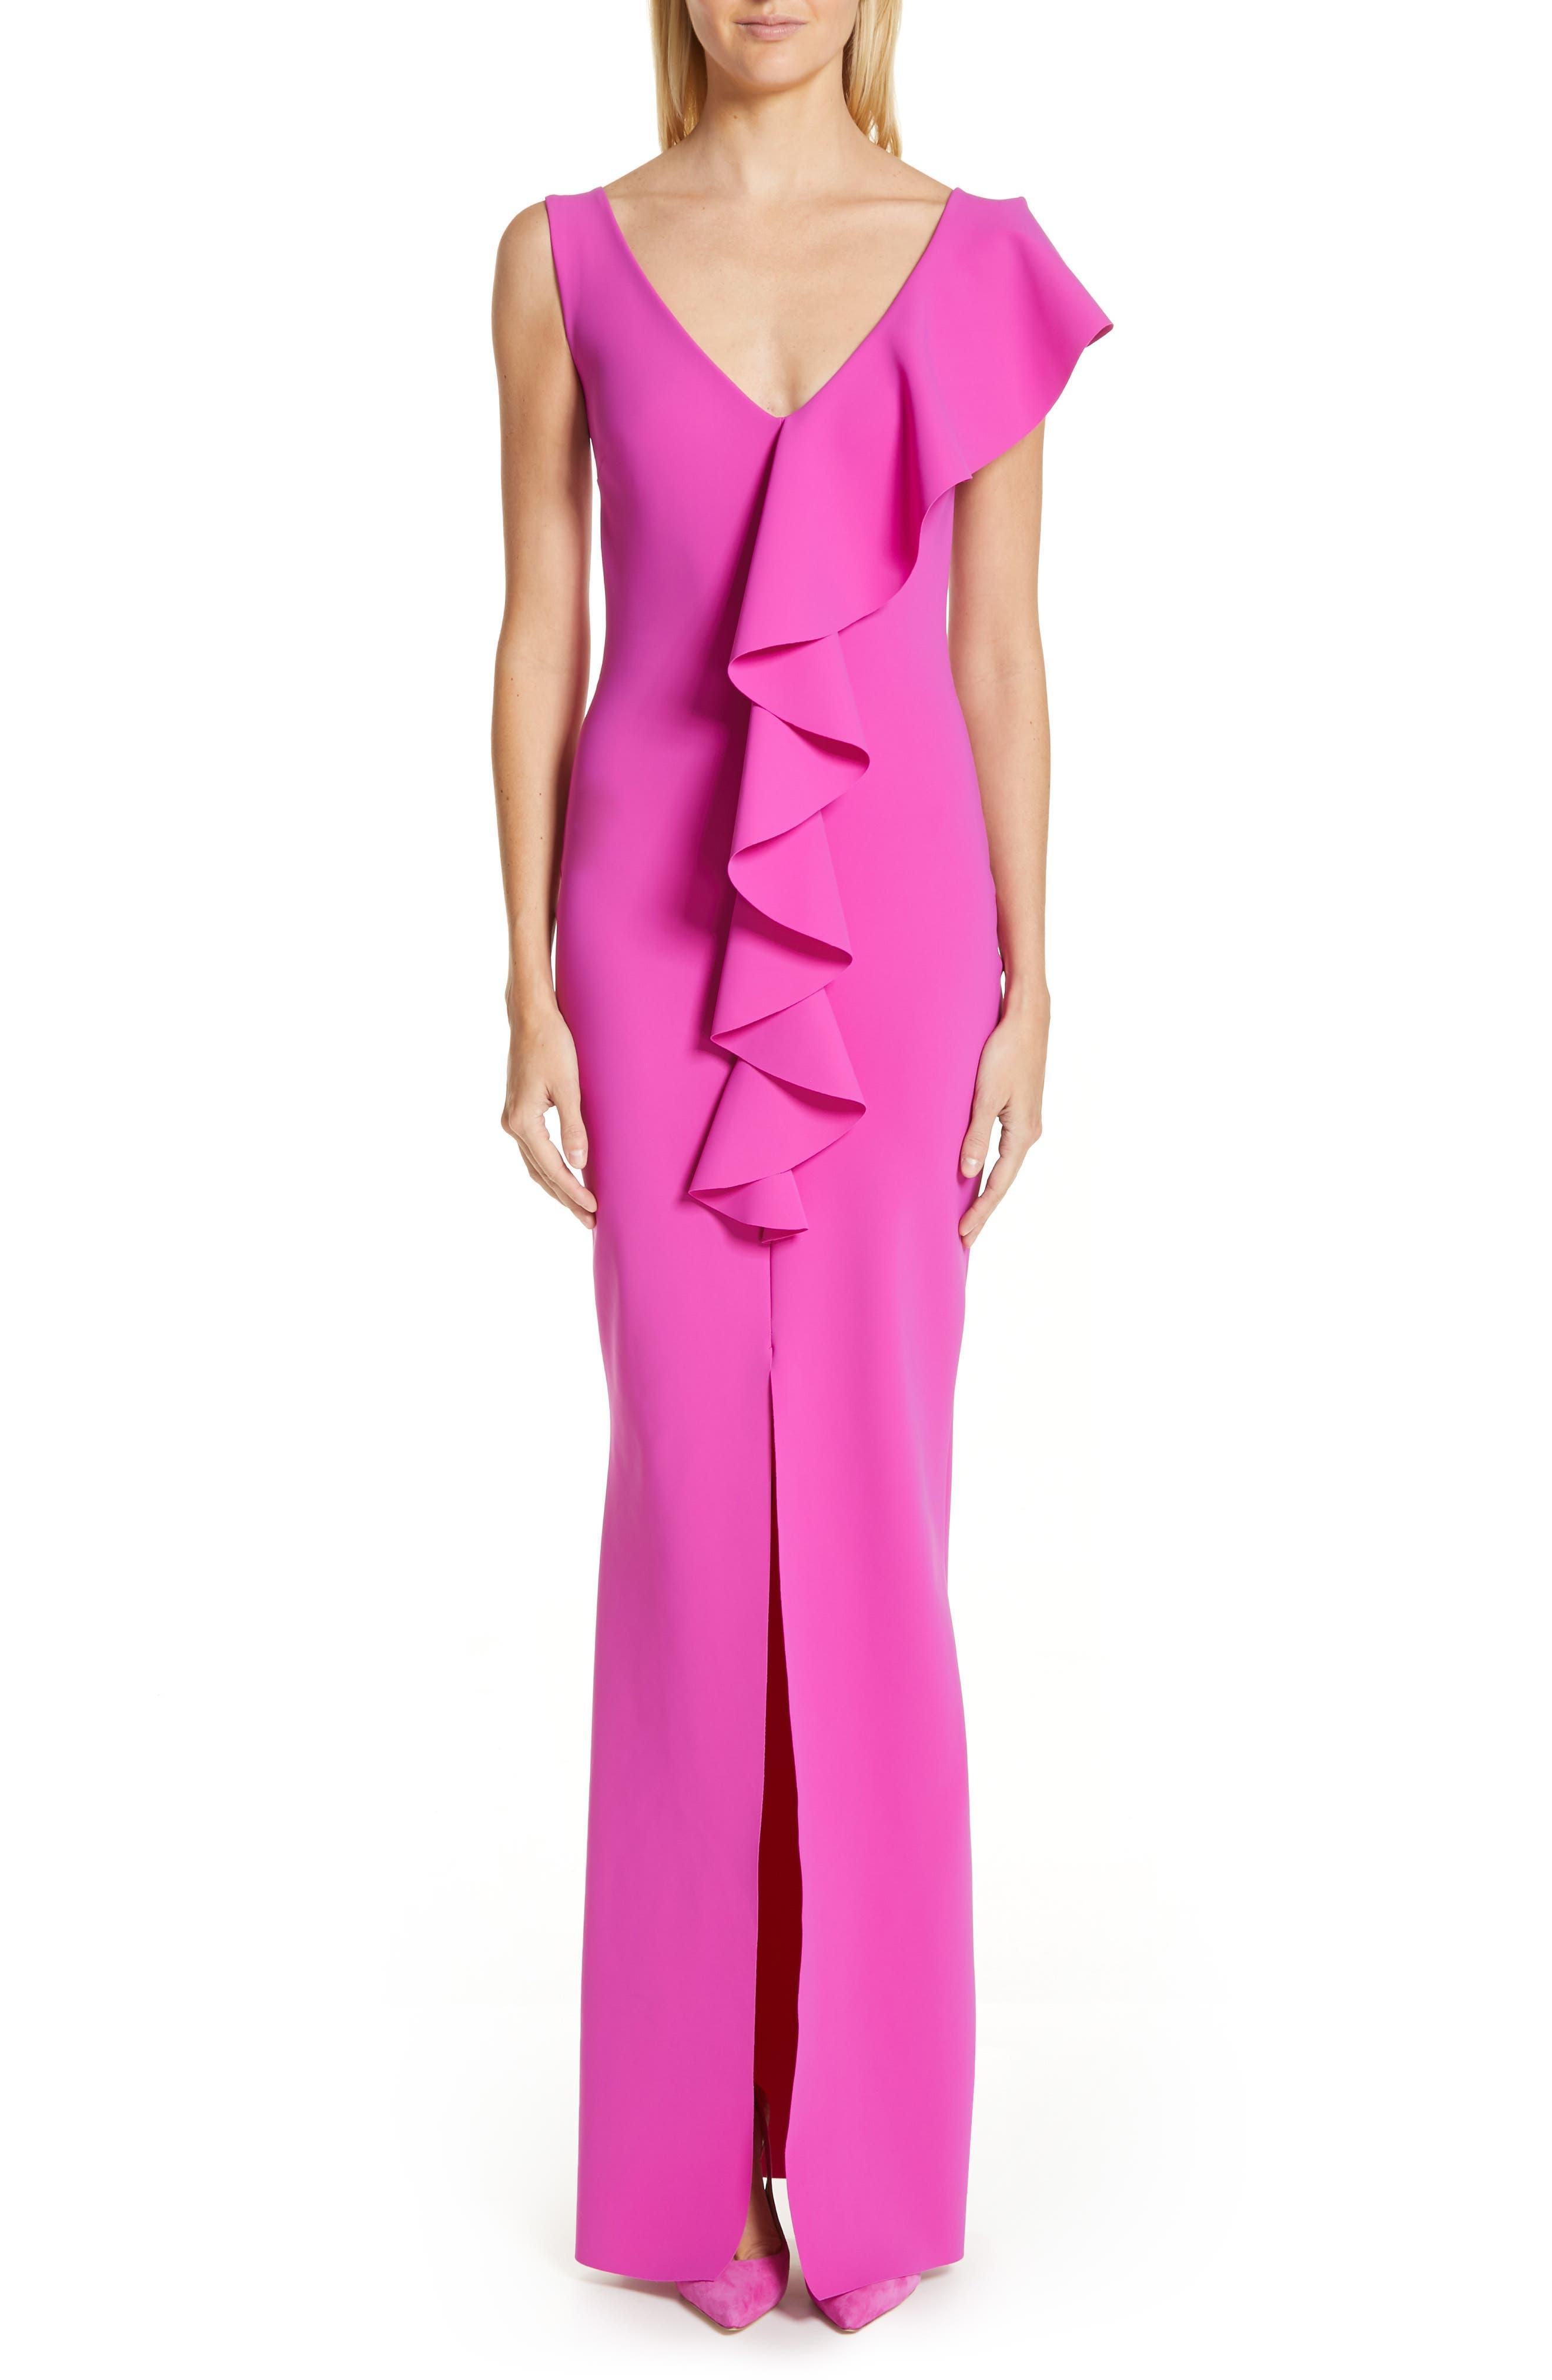 Chiara Boni La Petite Robe Boudicea Ruffle Evening Dress, US / 42 IT - Purple